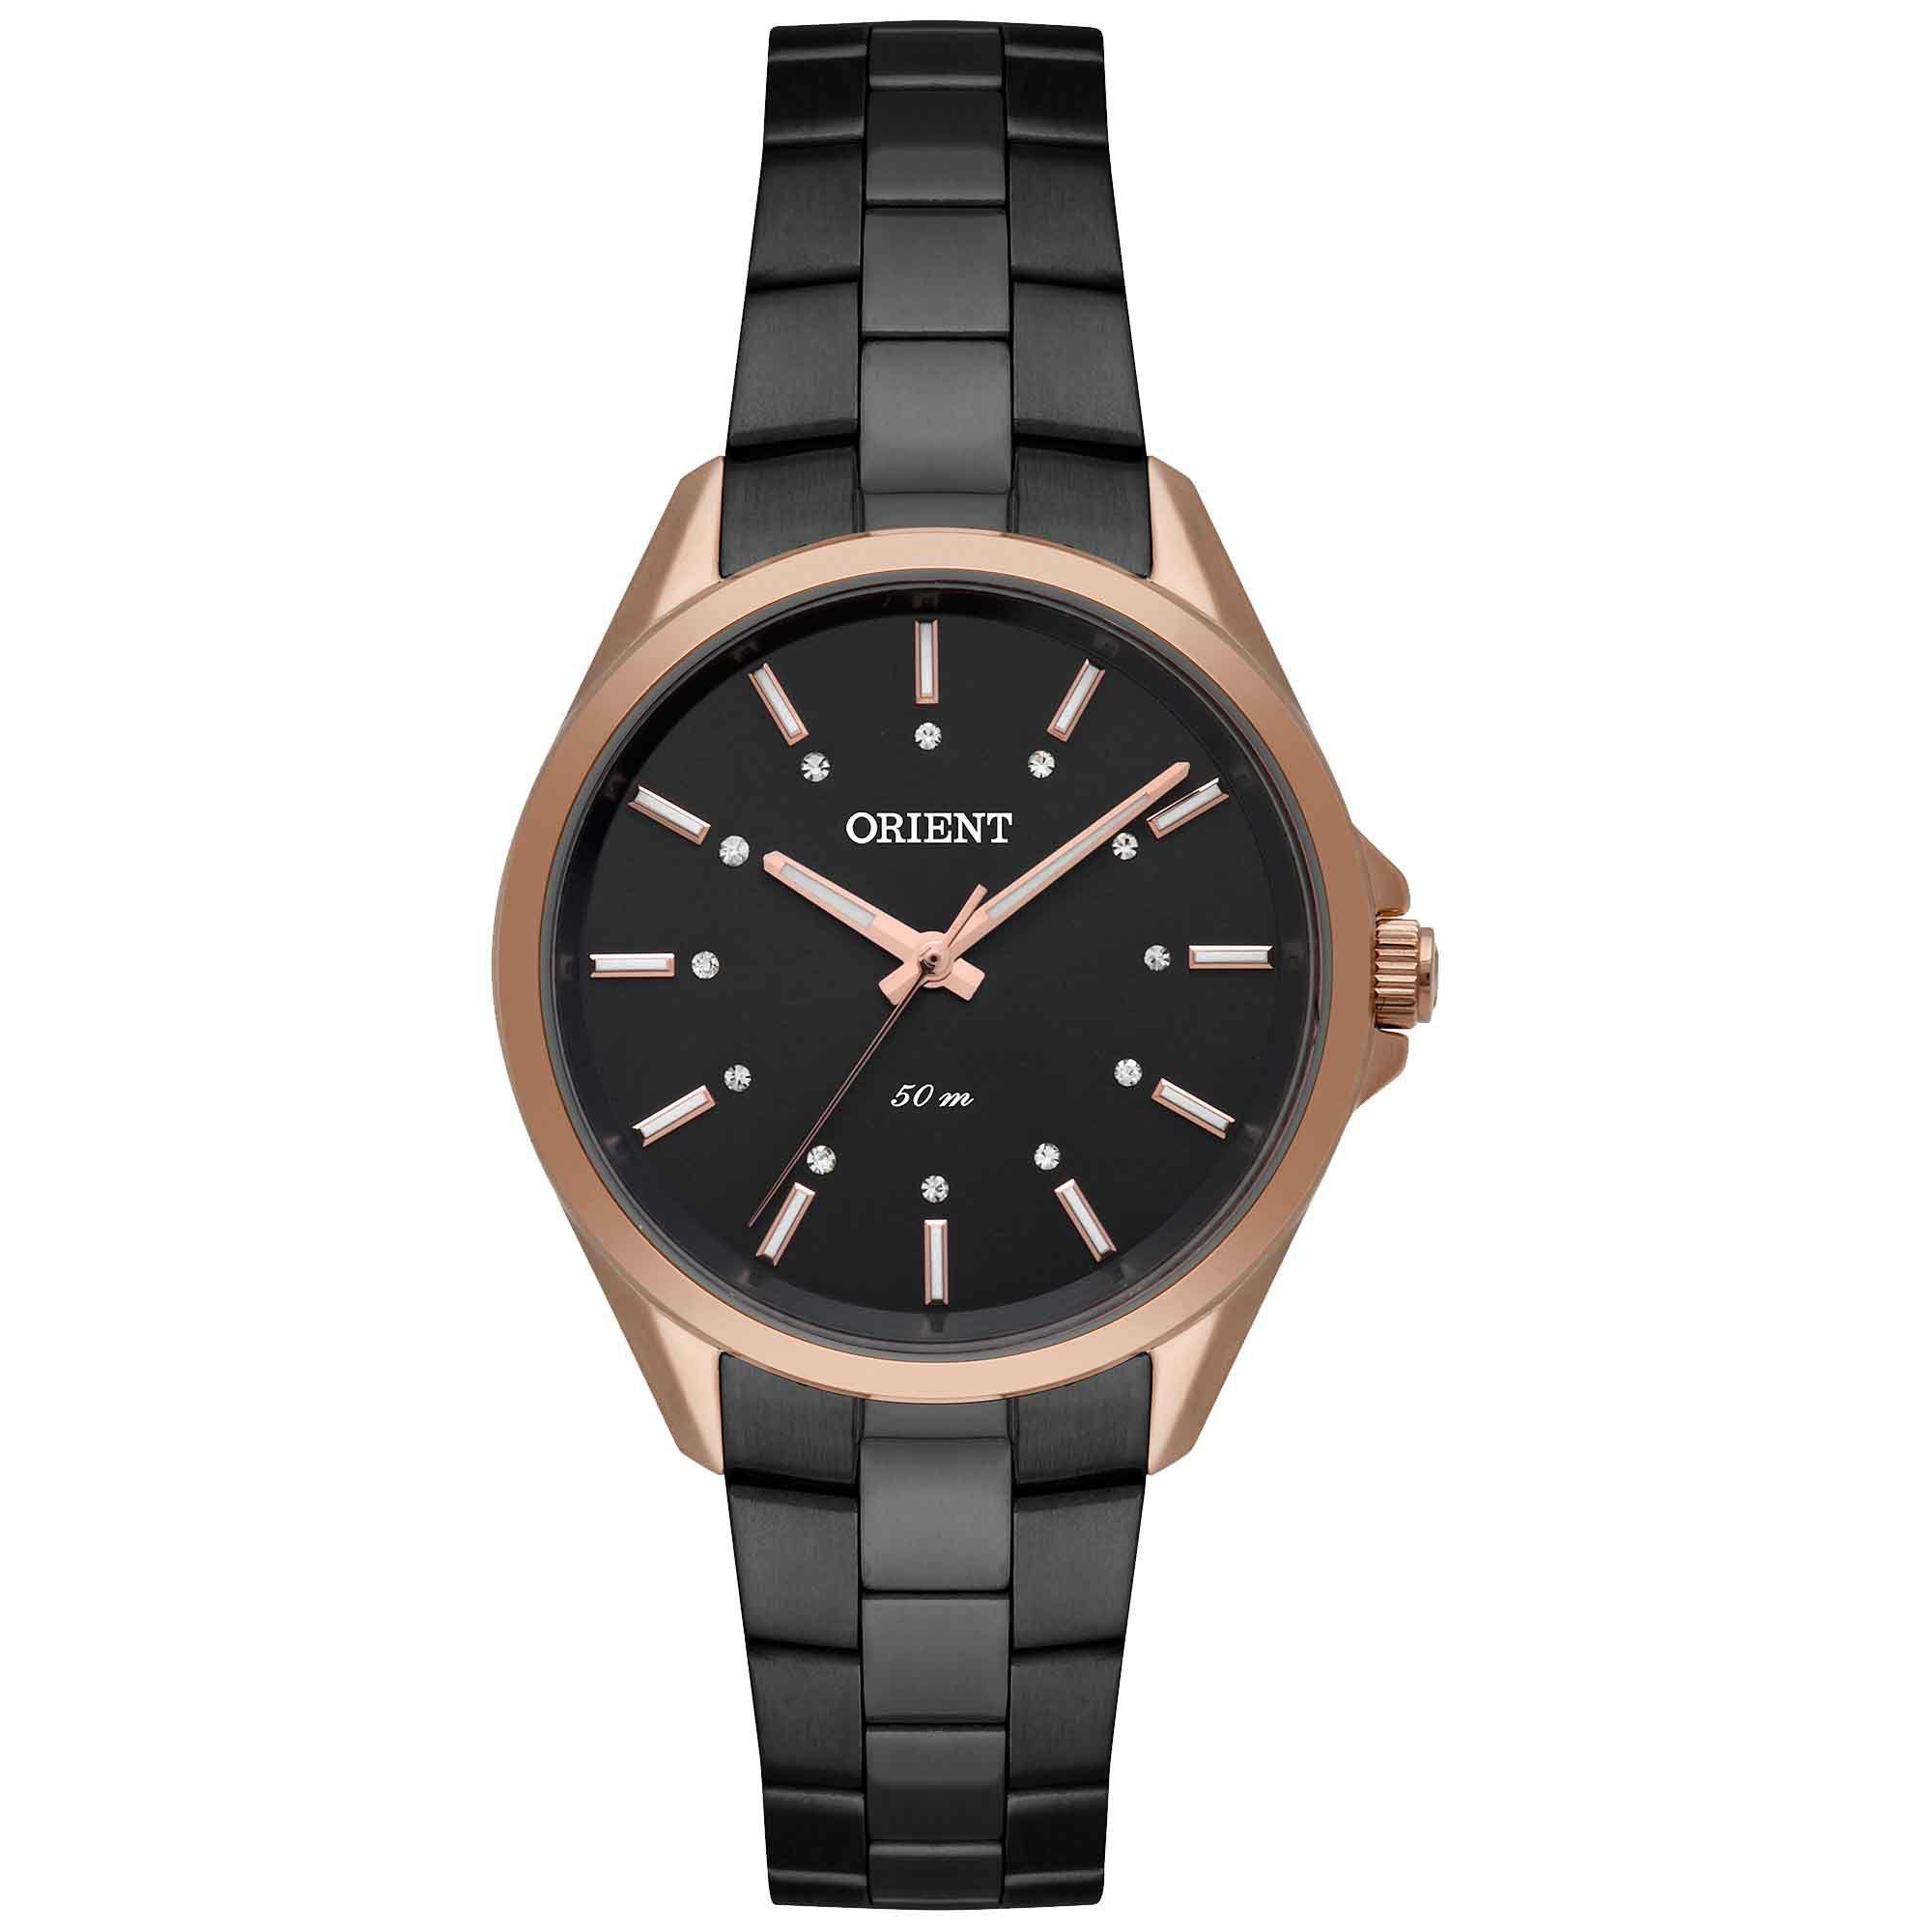 Relógio Feminino Orient FTSS0069 G1PX